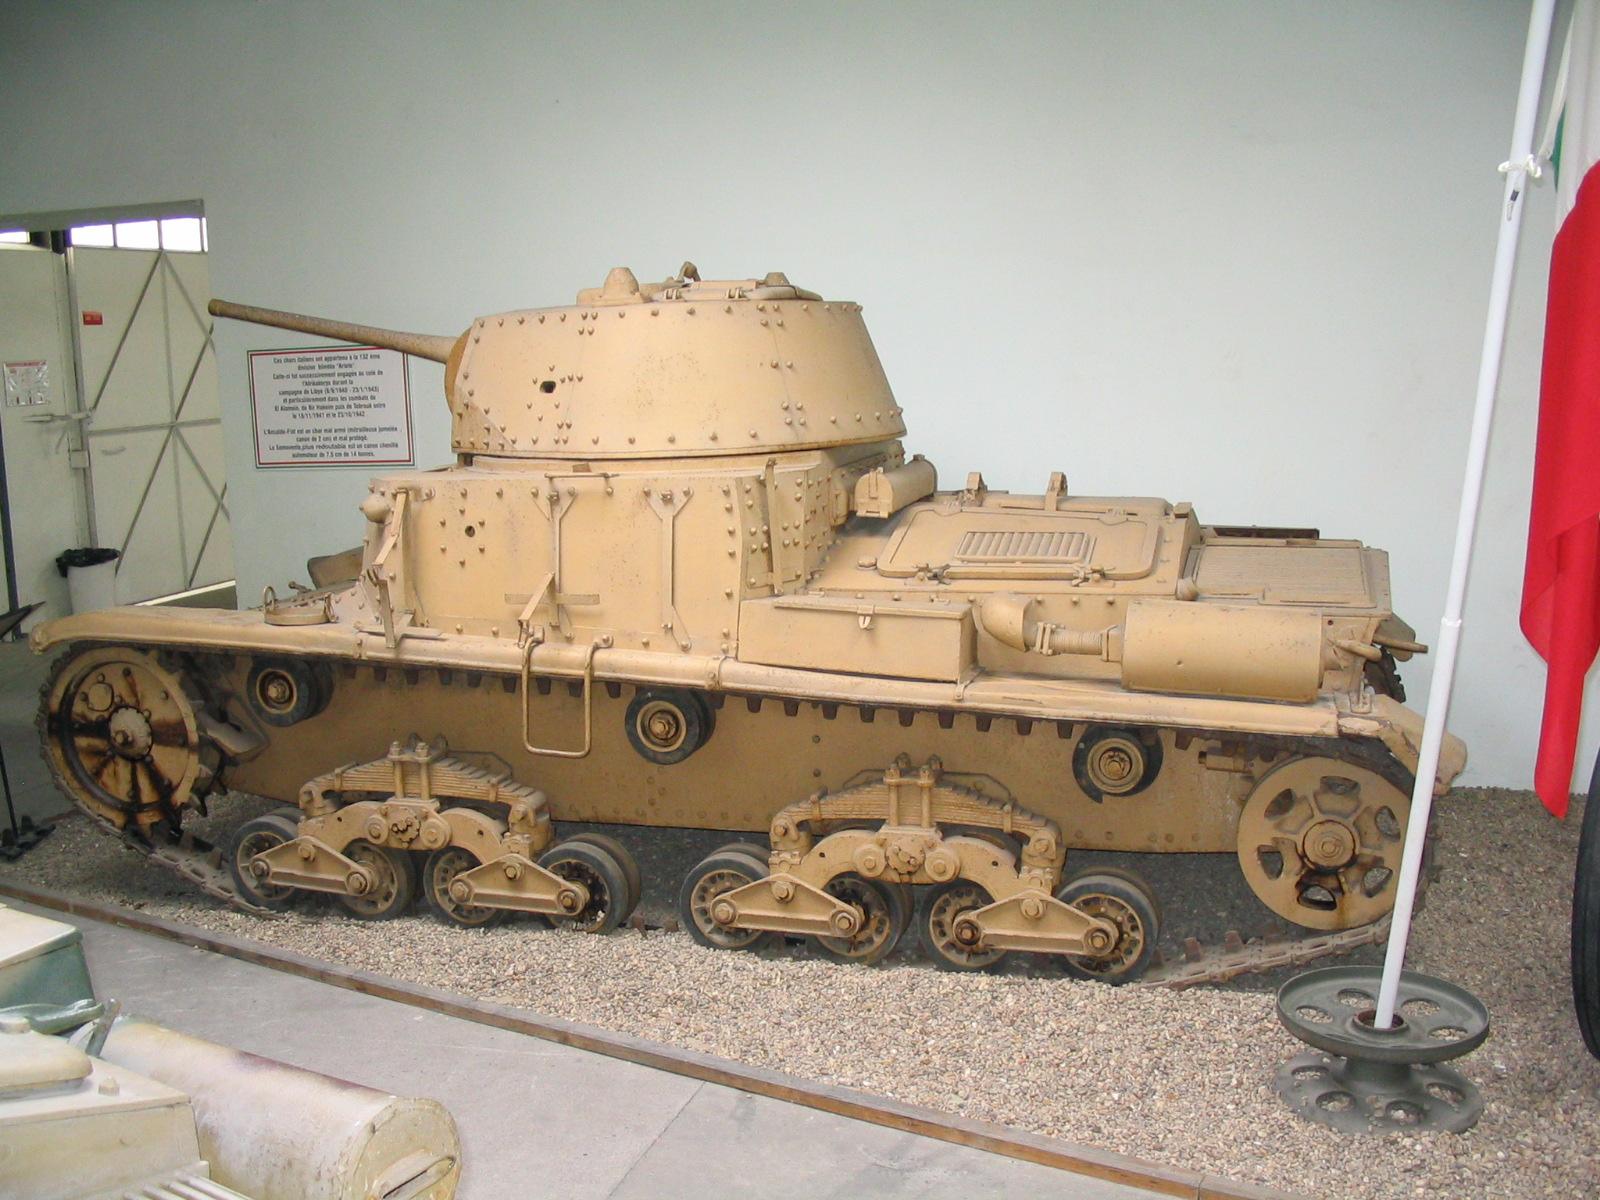 Ansaldo-Fiat M15/42 Medium Tank | Ww2 Italy planes, tanks, and ...